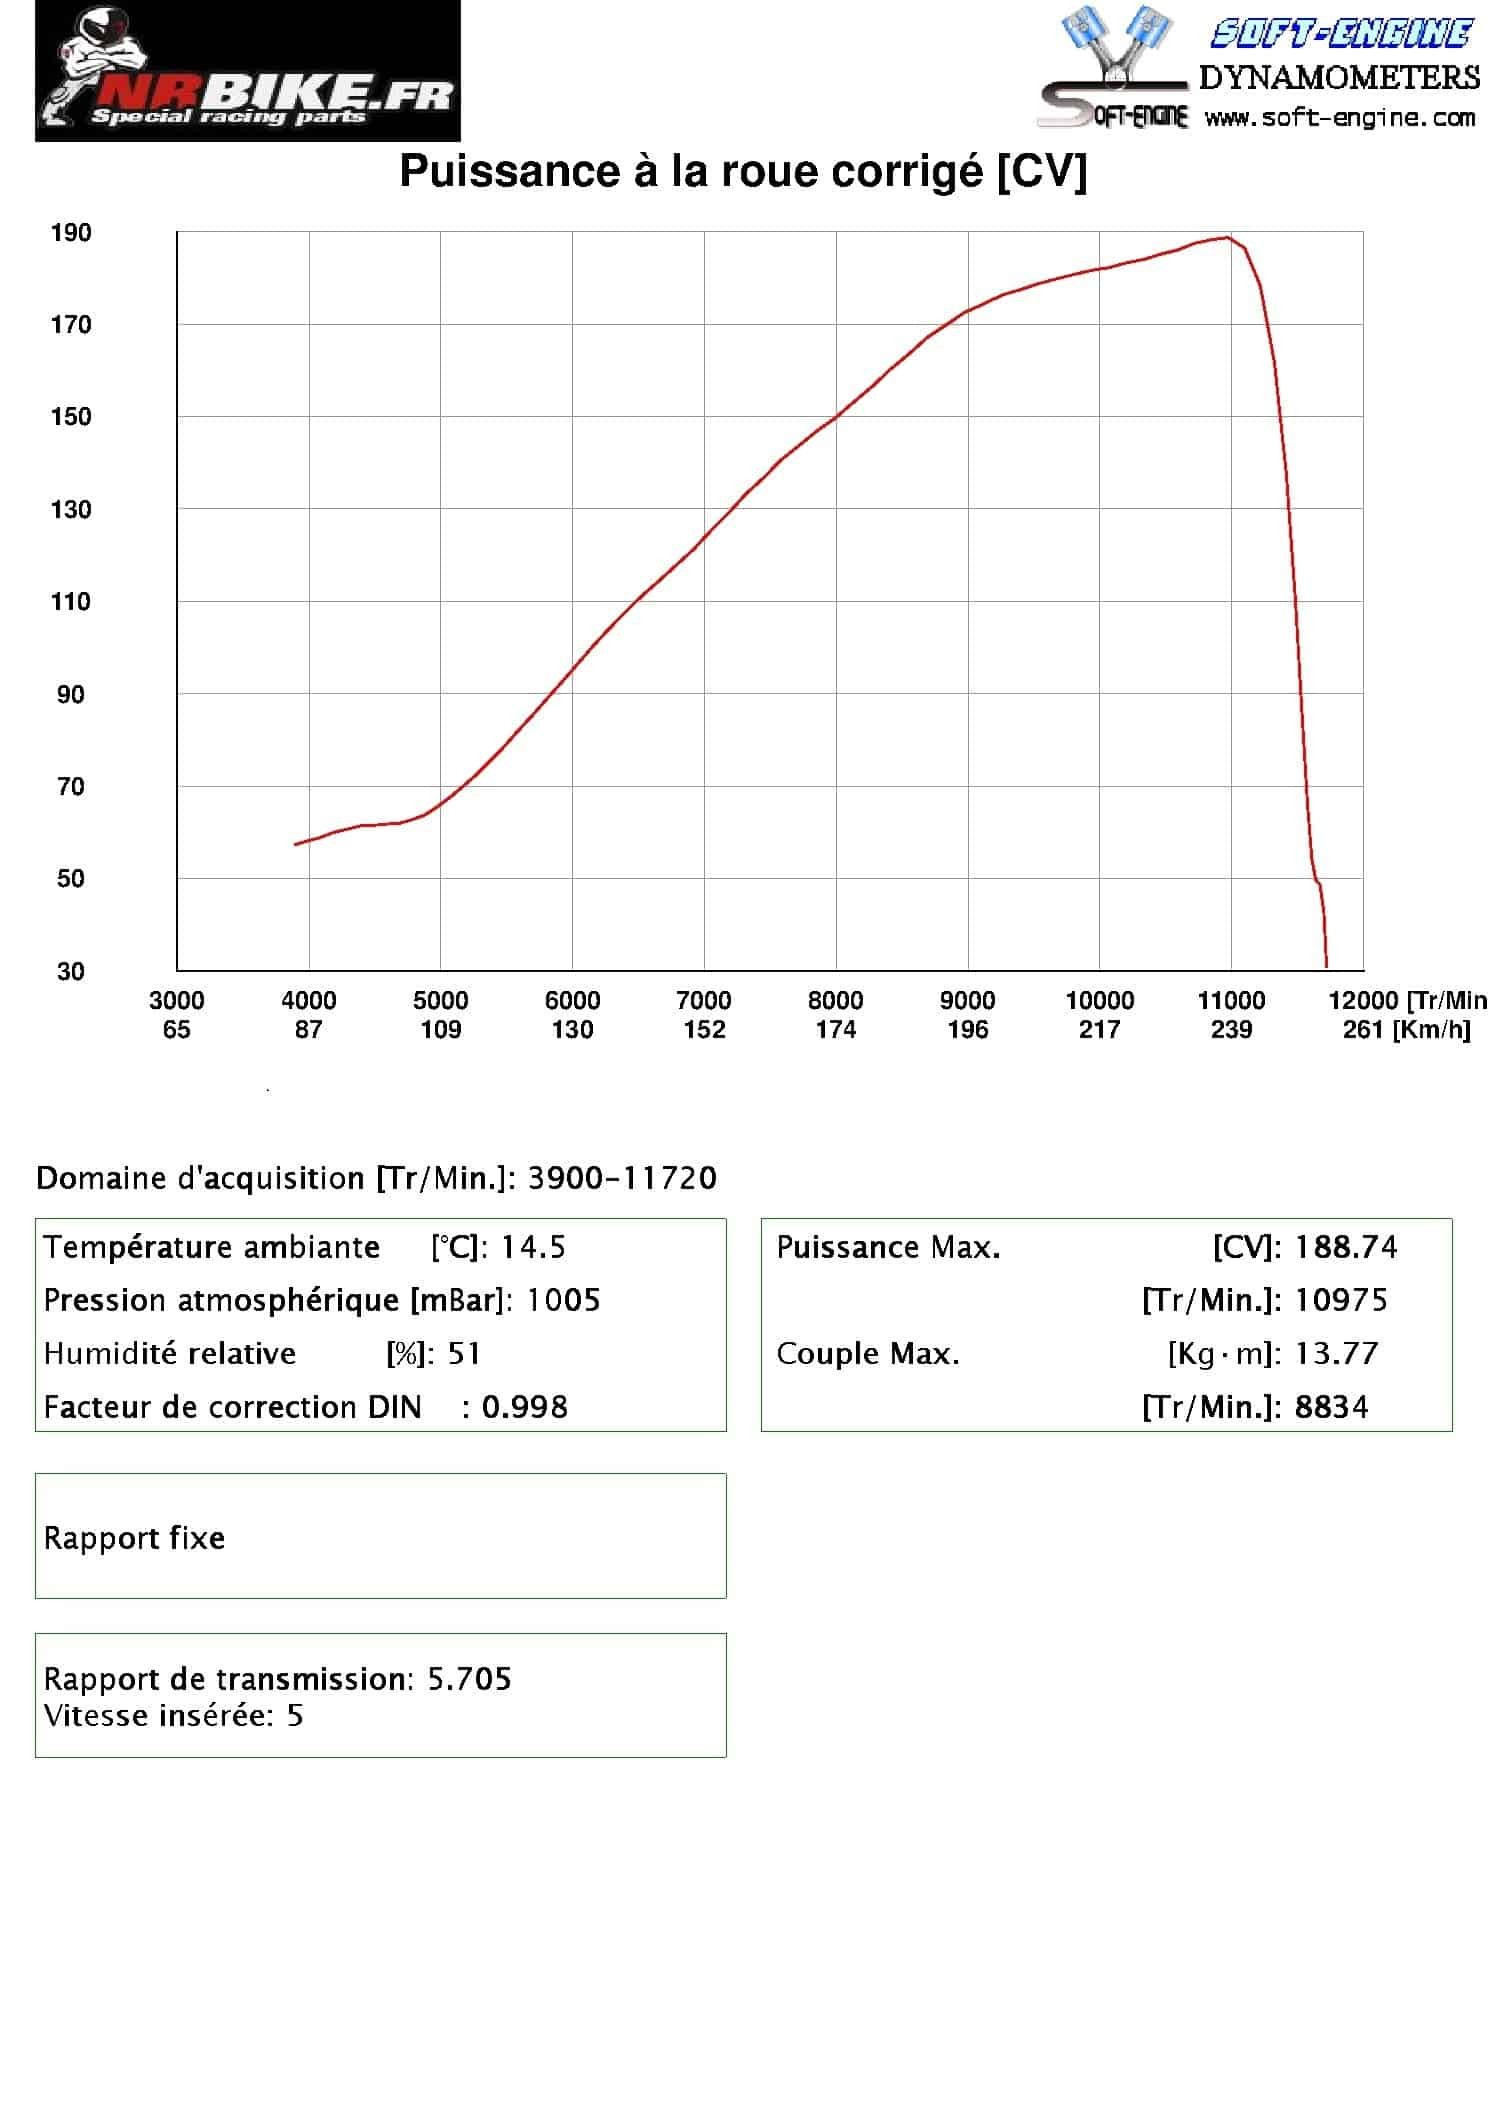 1199 R / Ligne Termignoni SSTK Type 2